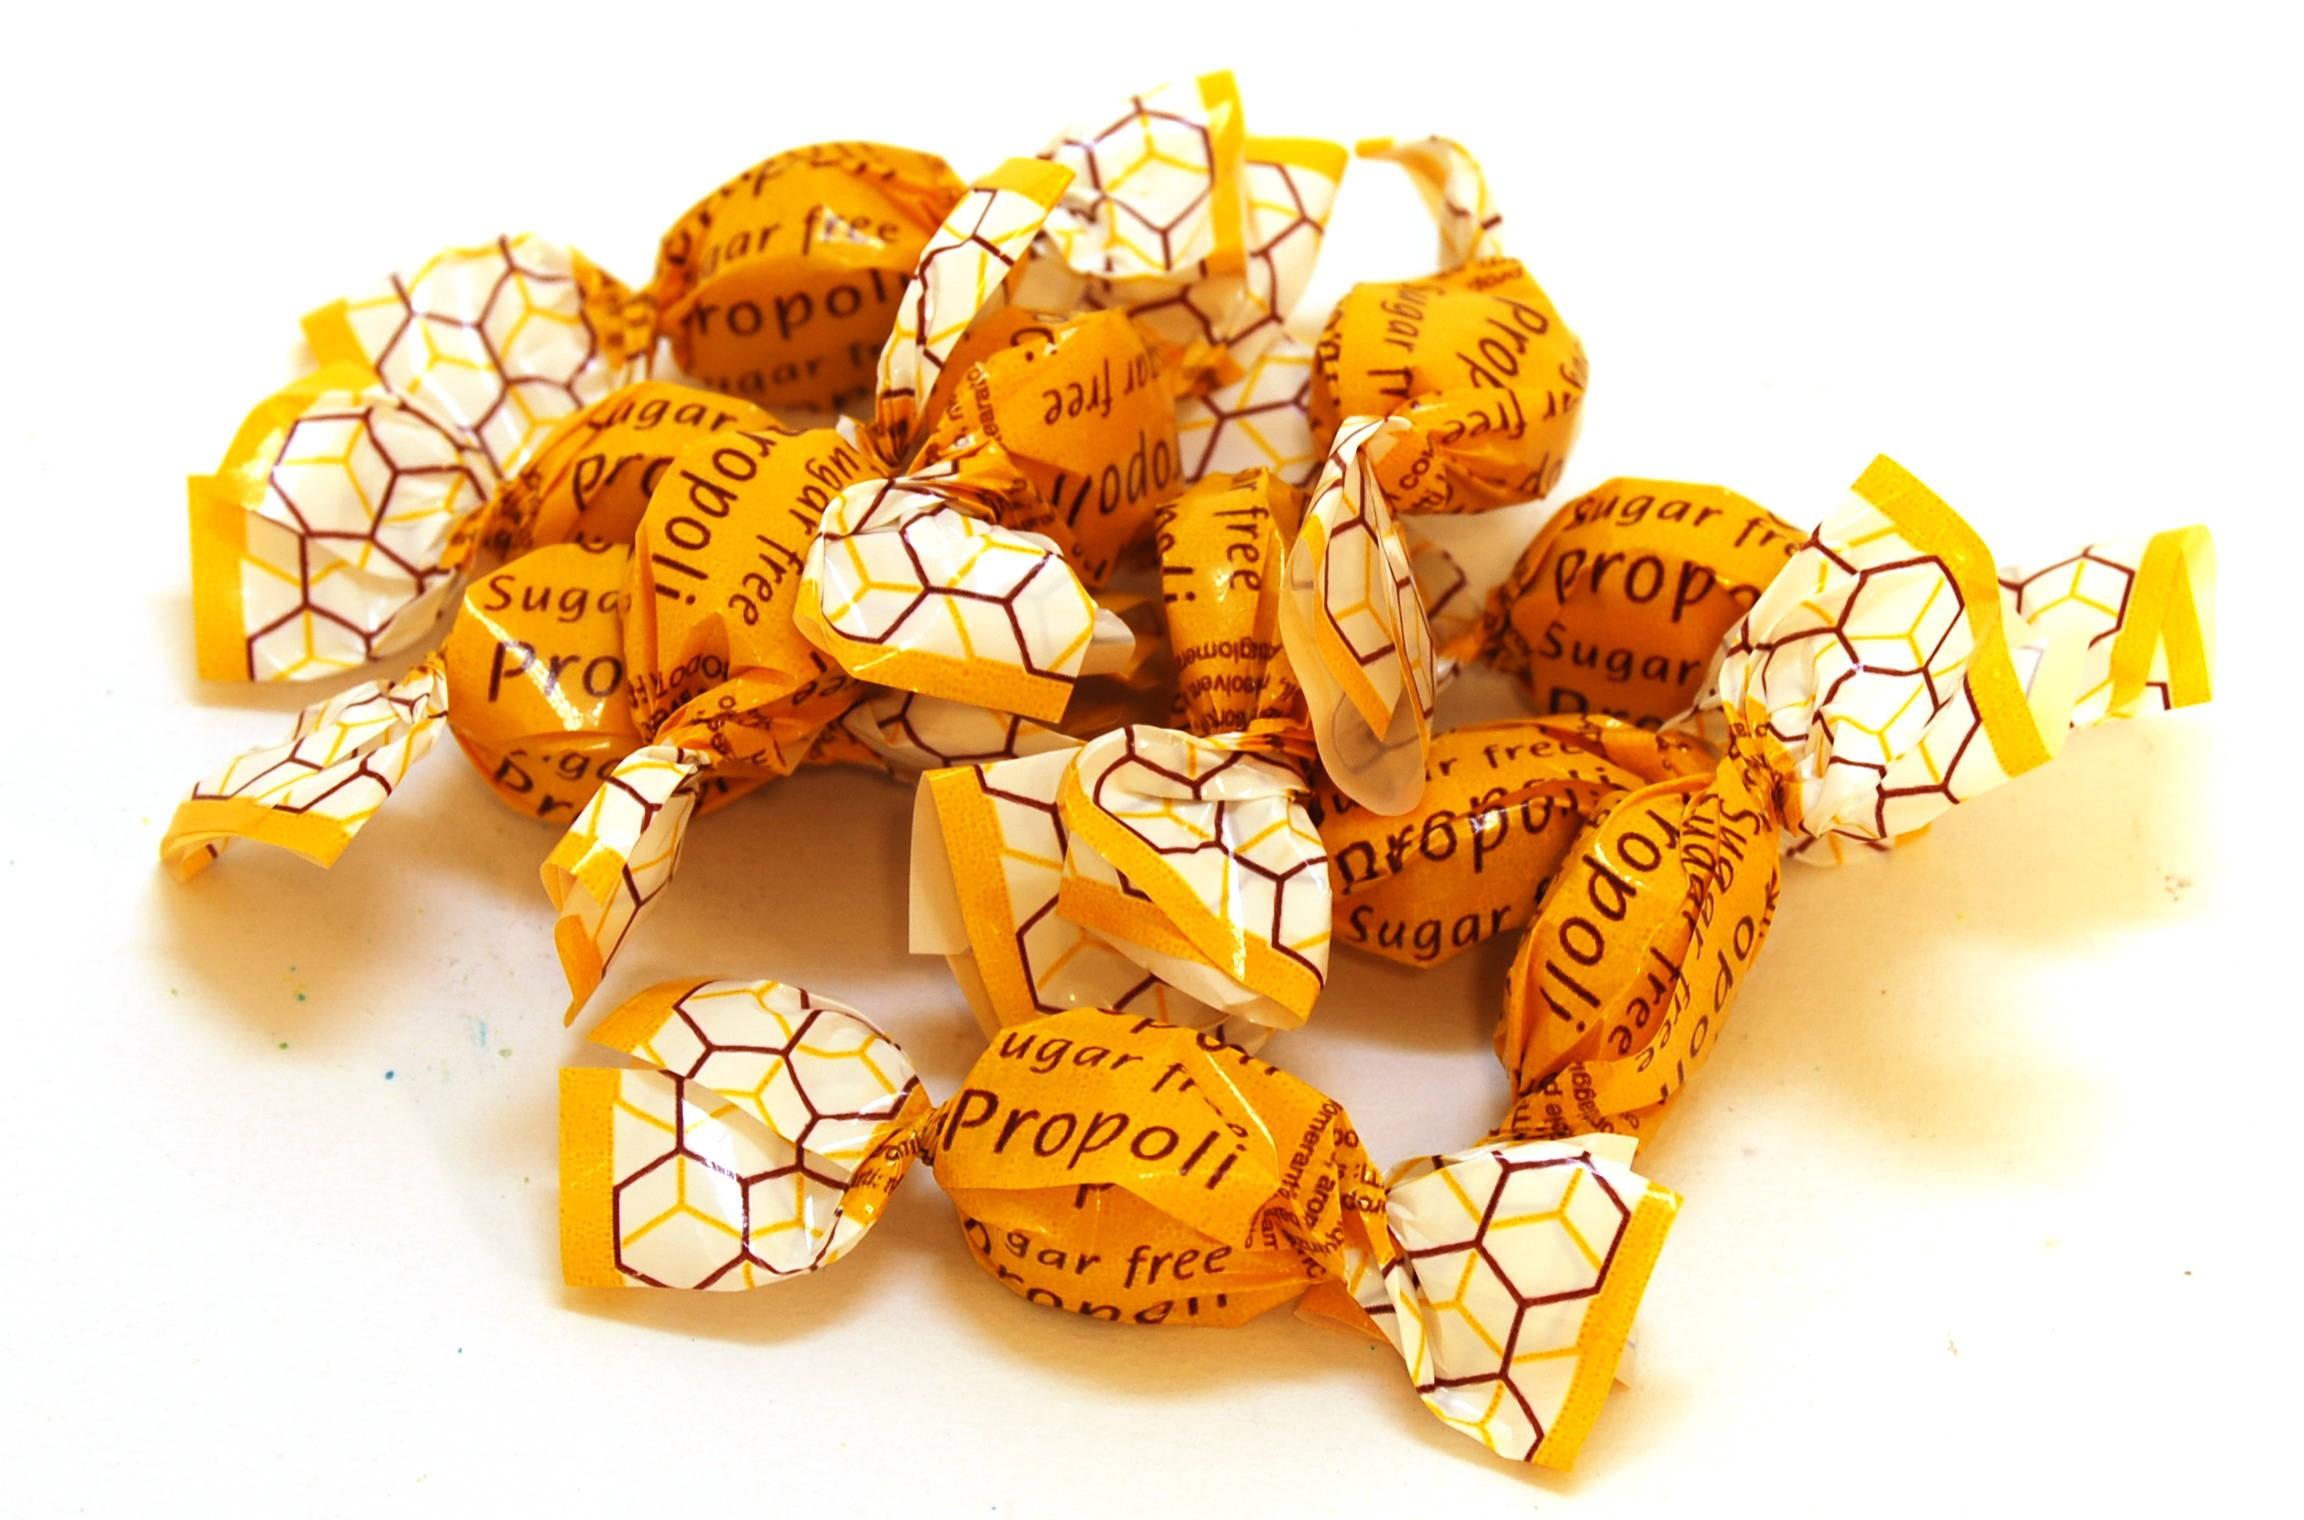 Caramella Lietta Propoli Senza Zucchero